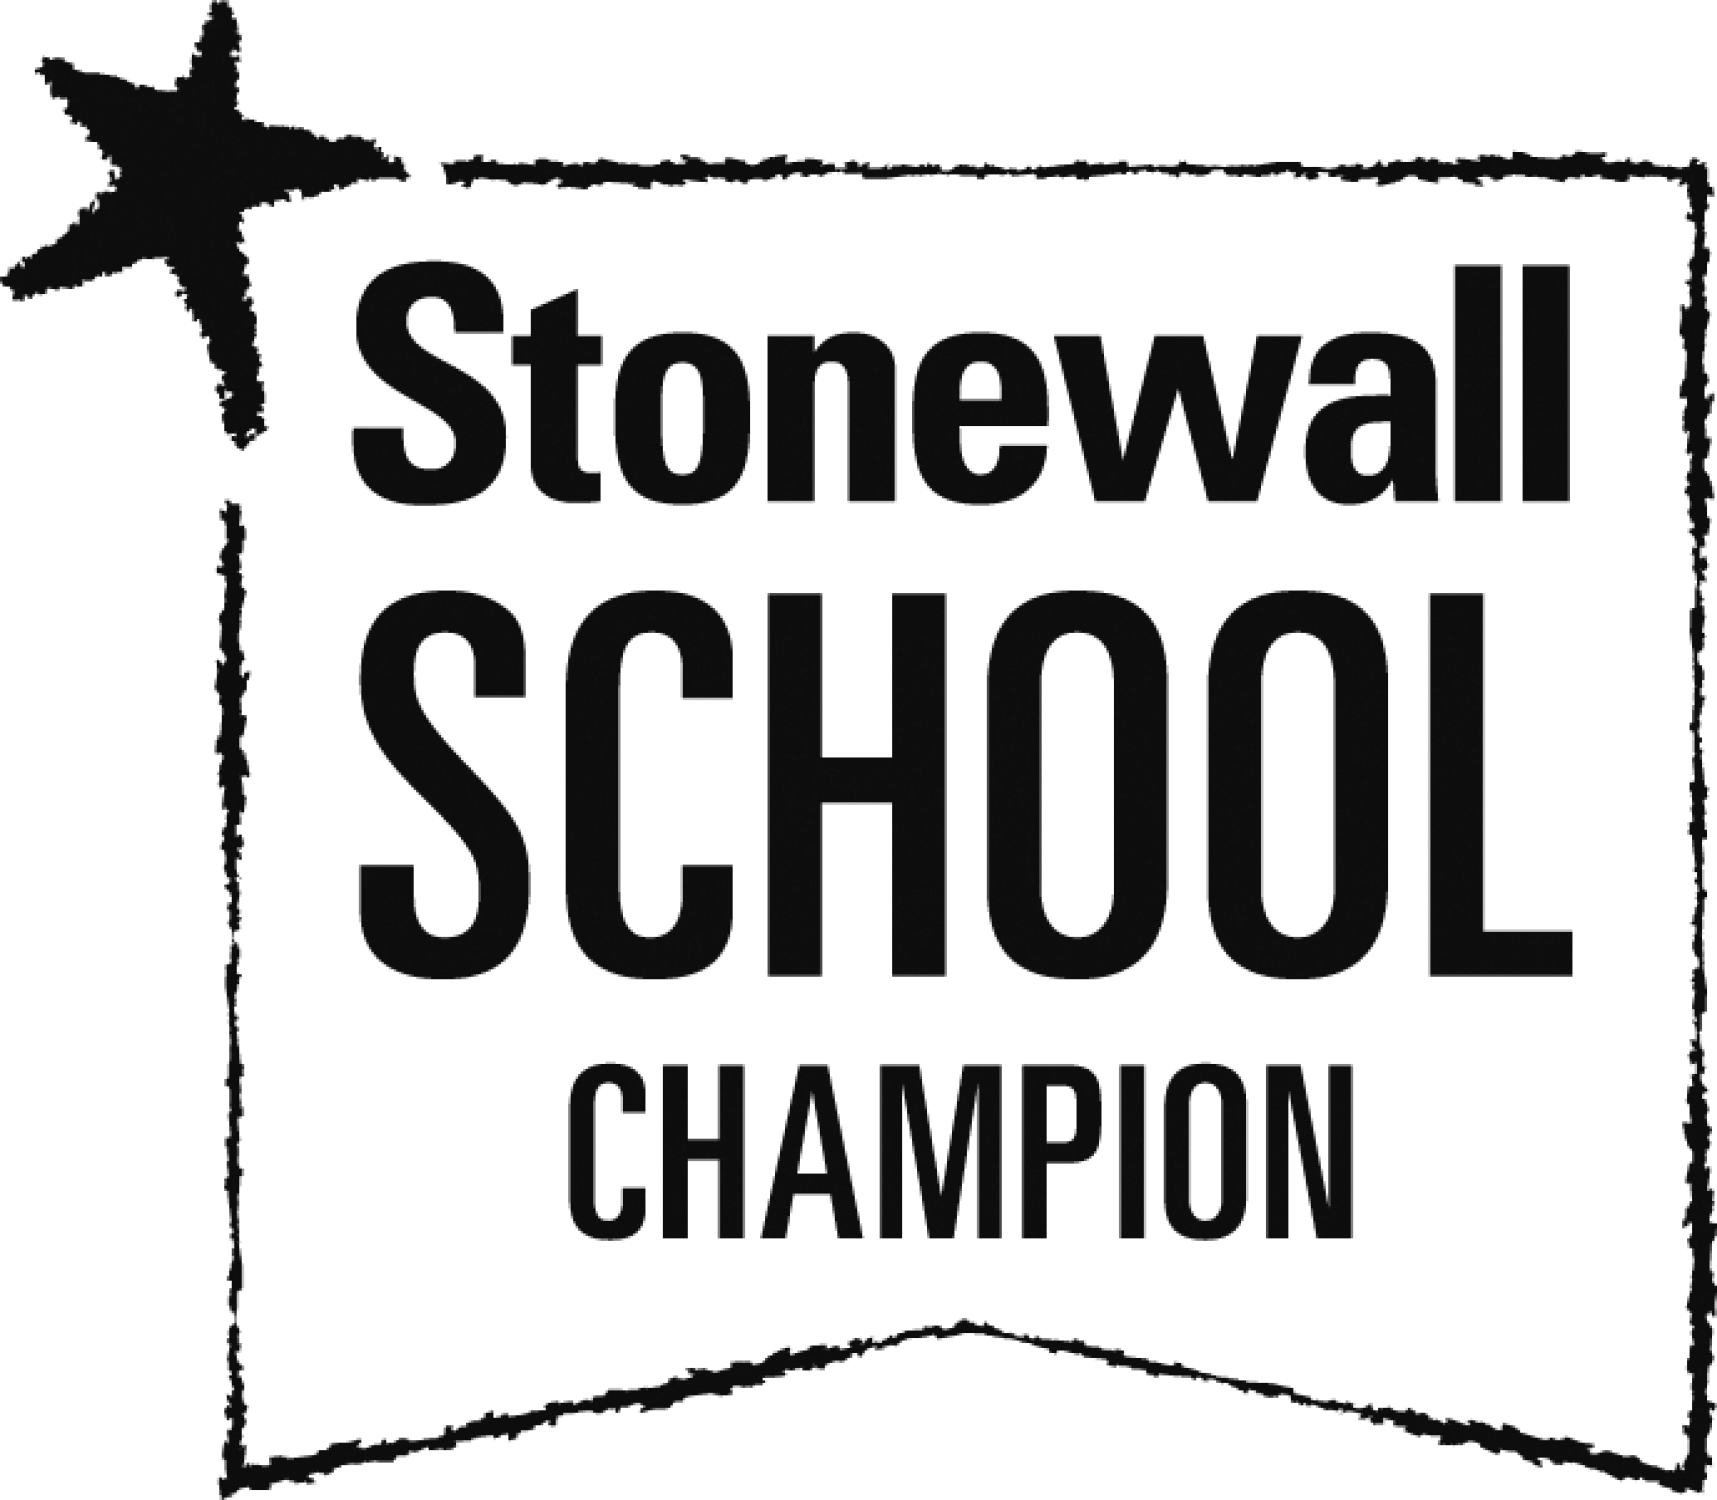 stonewall-schoolchampion-logo-black_0-min